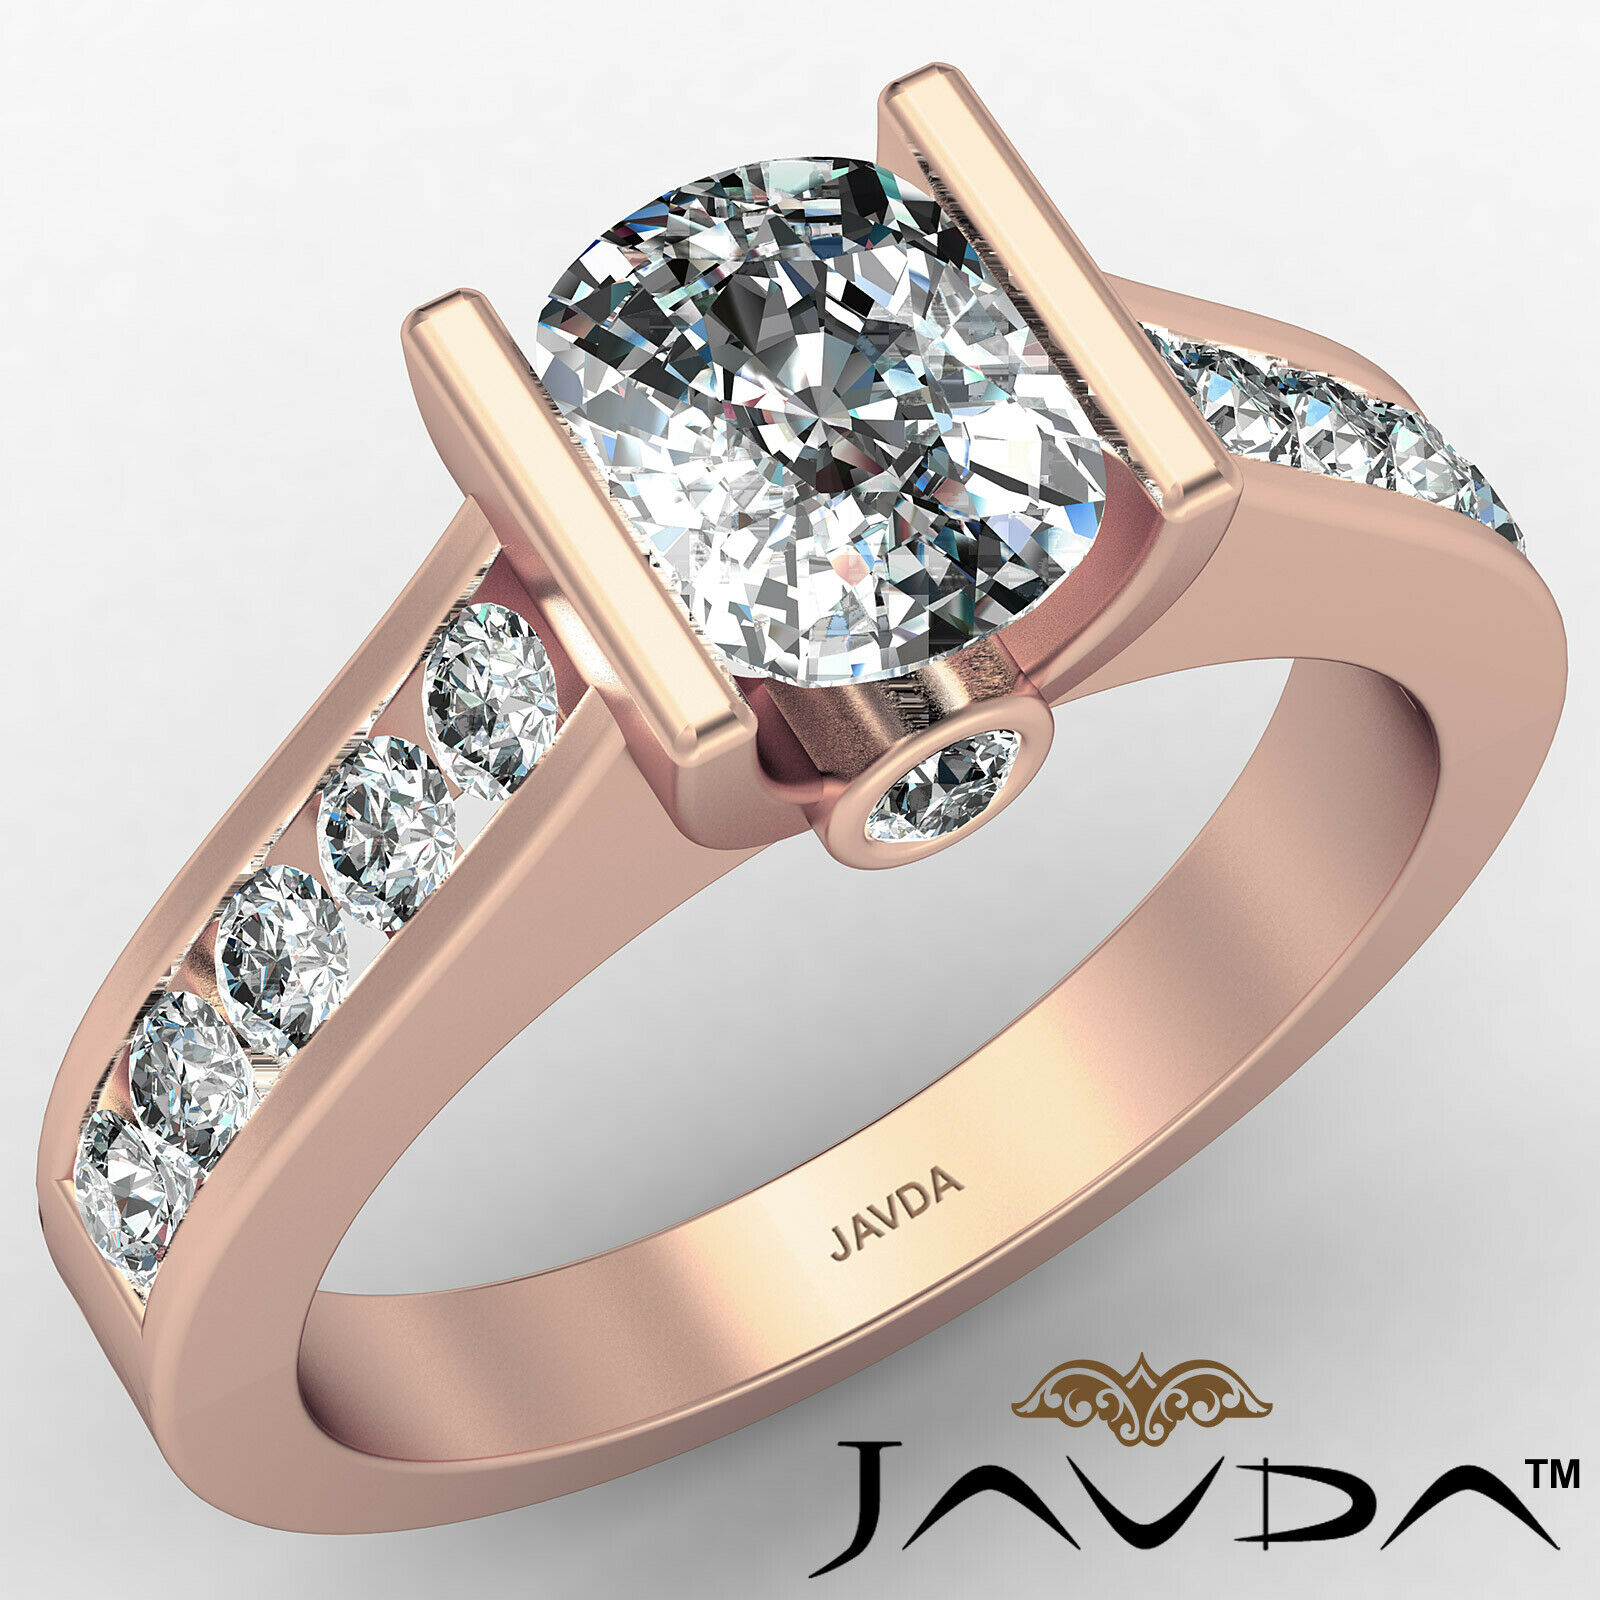 Bezel Cushion Diamond Engagement Women's Ring GIA, J Color SI1 clarity 1.53 ctw. 2